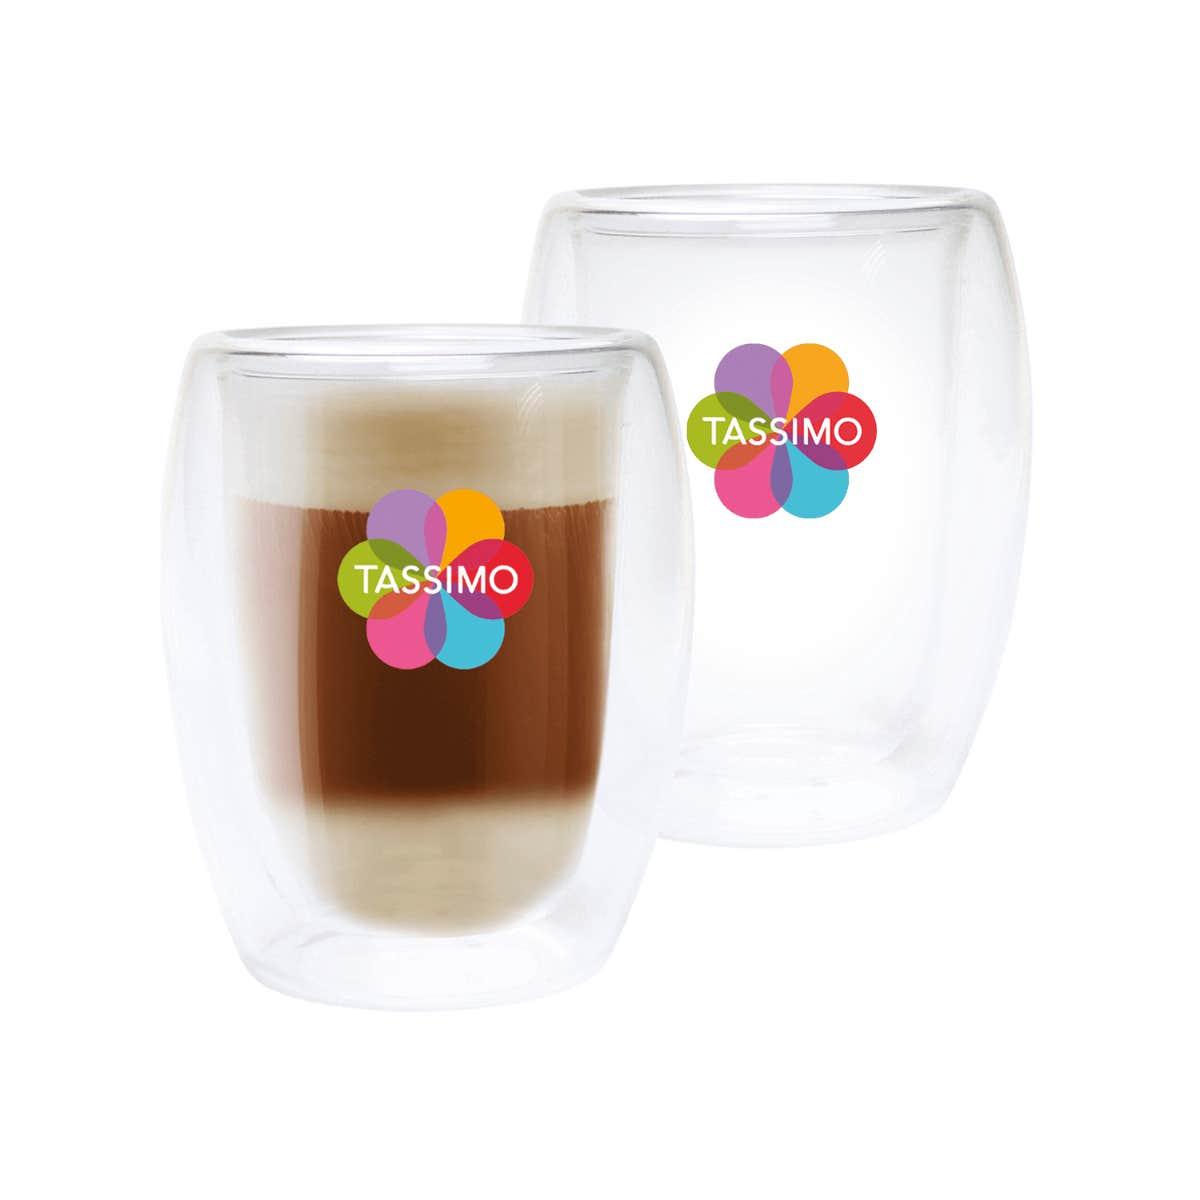 TASSIMO Vasos para latte, paquete de 2